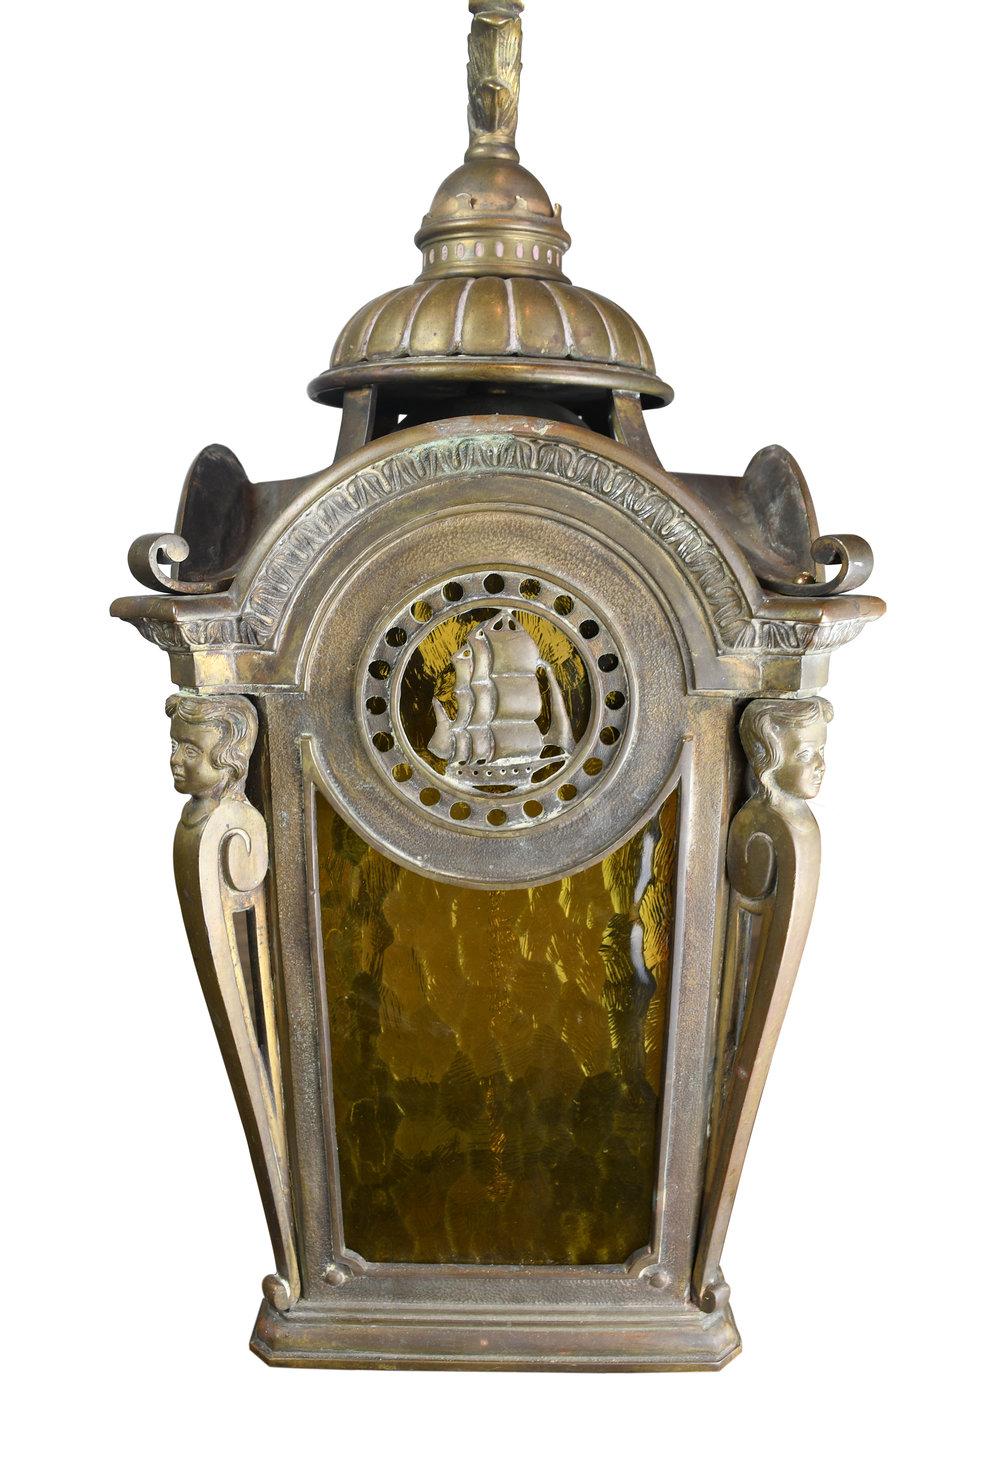 47058-cast-bronze-lantern-sconce-with-bracket-26.jpg